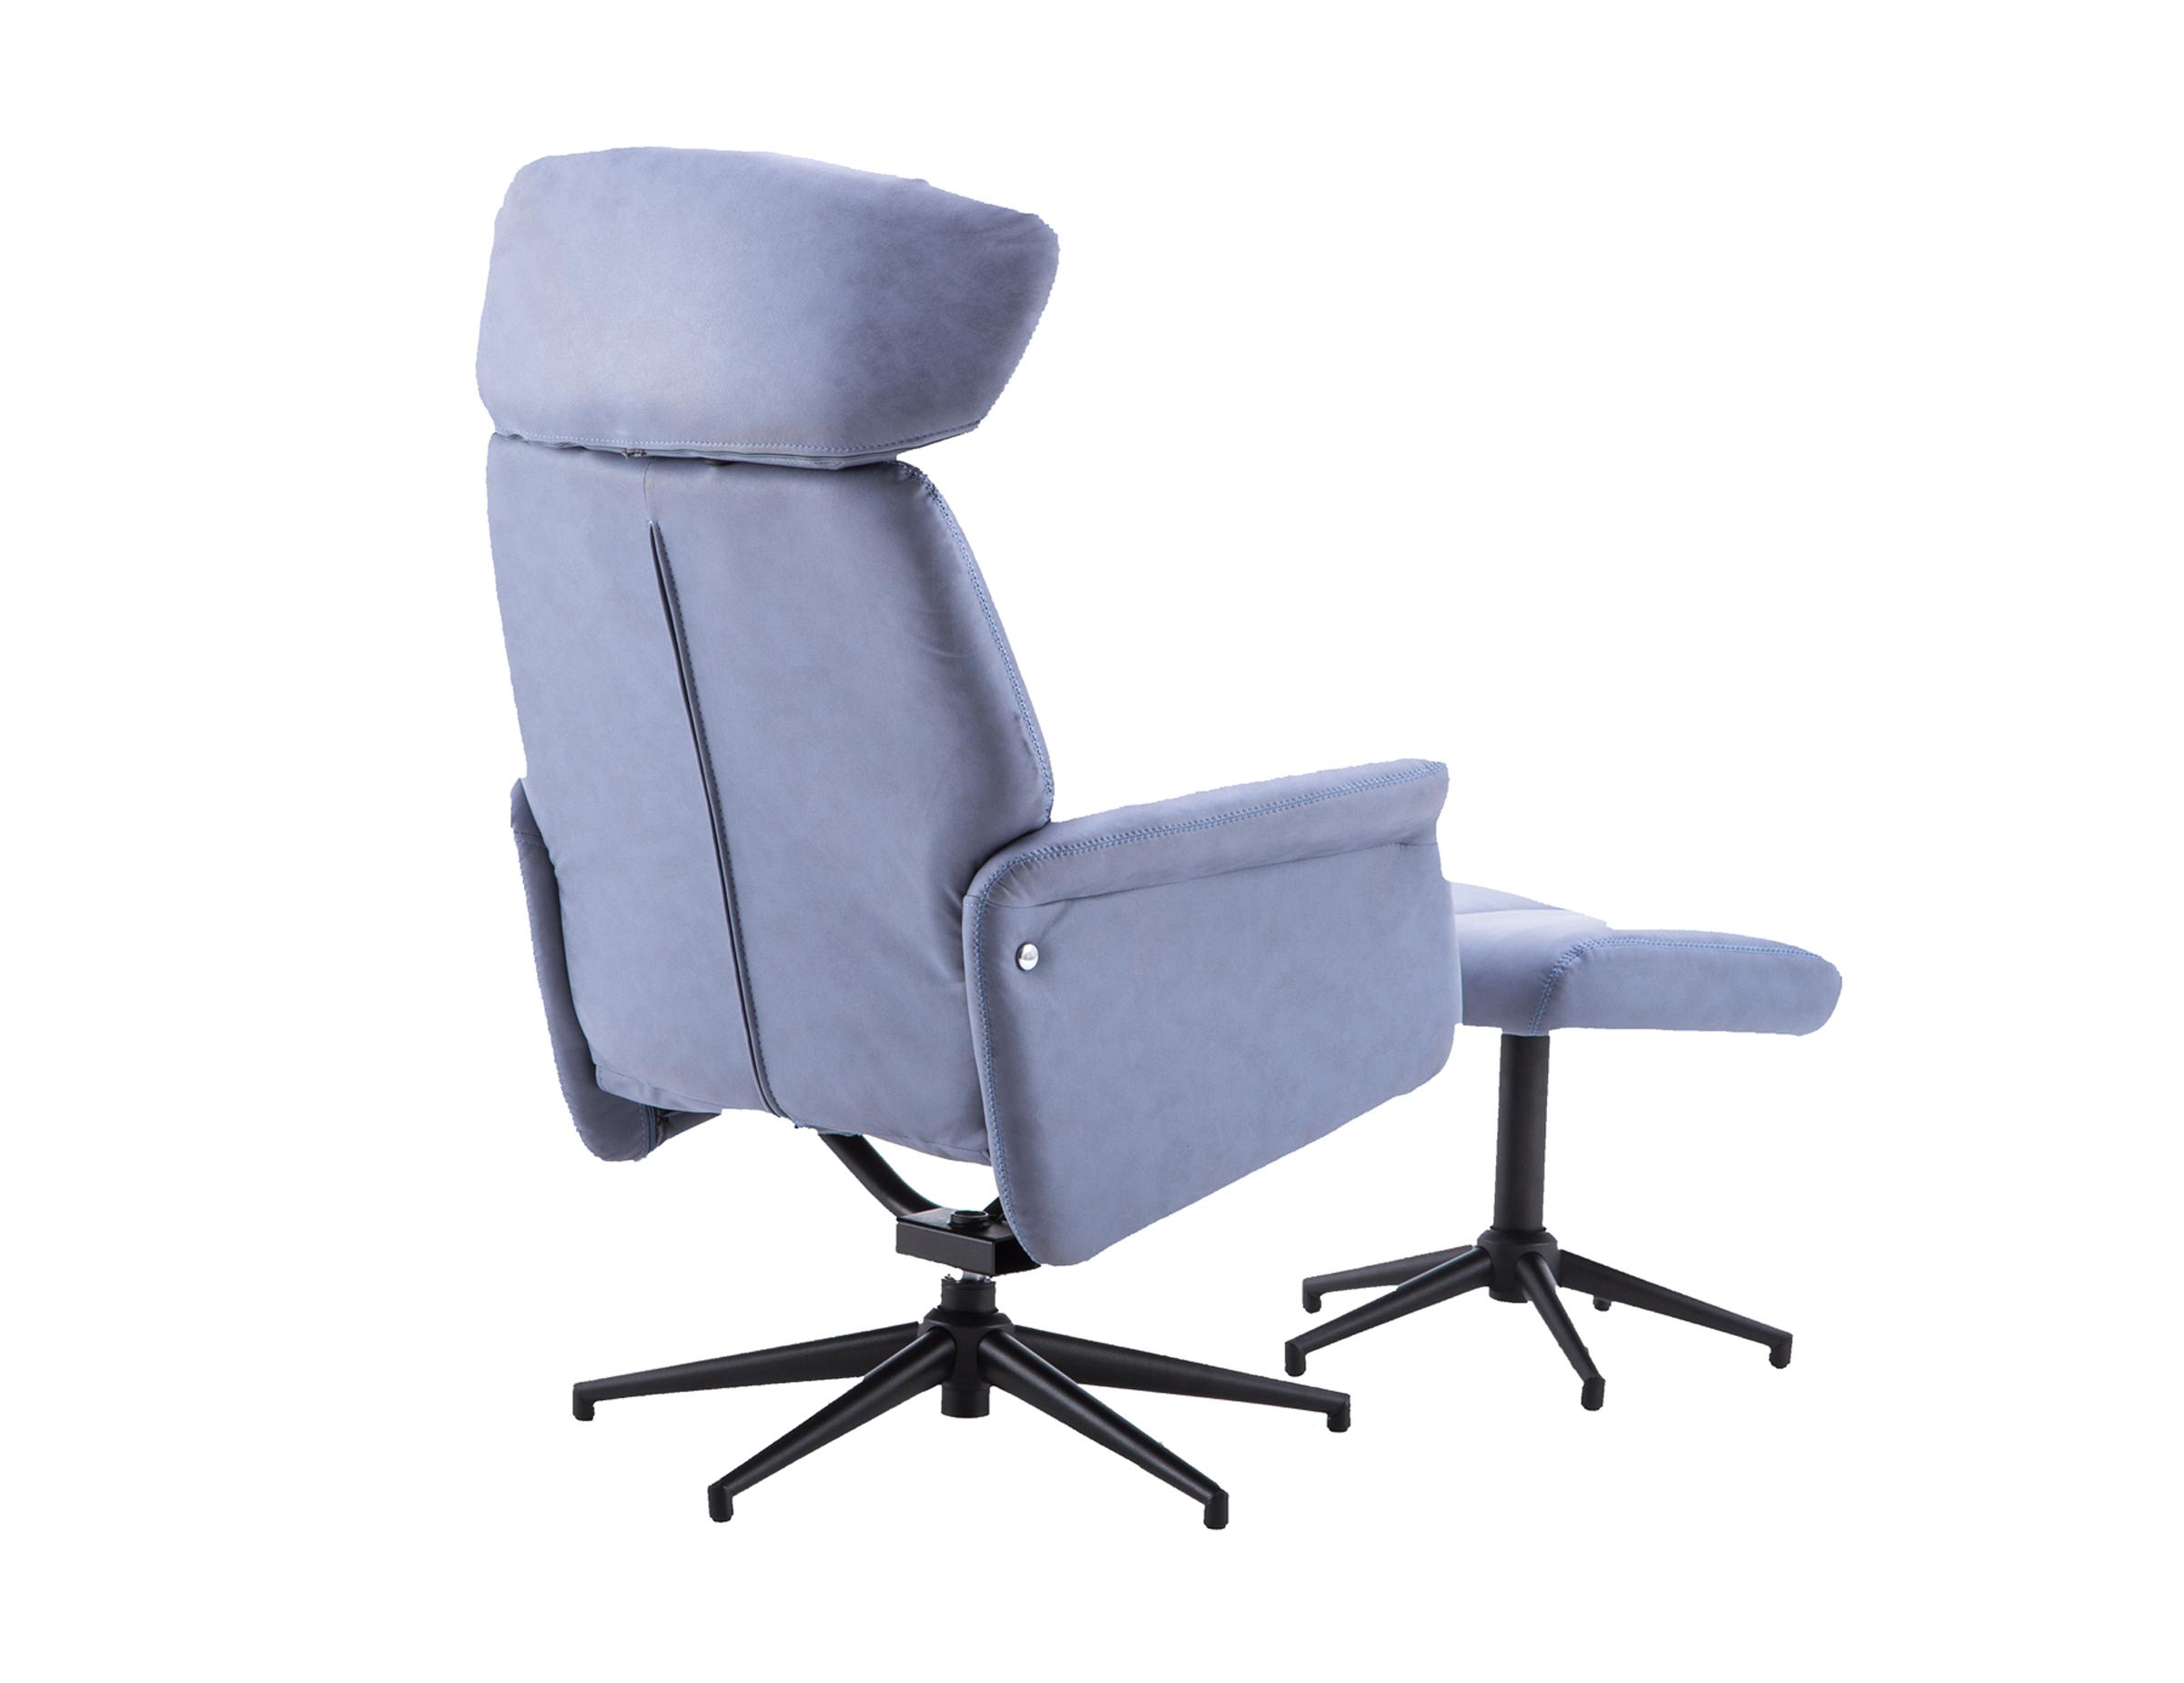 mcombo relaxsessel fernsehsessel tv sessel kippbar dreh mit fu hocker stahlf en ebay. Black Bedroom Furniture Sets. Home Design Ideas